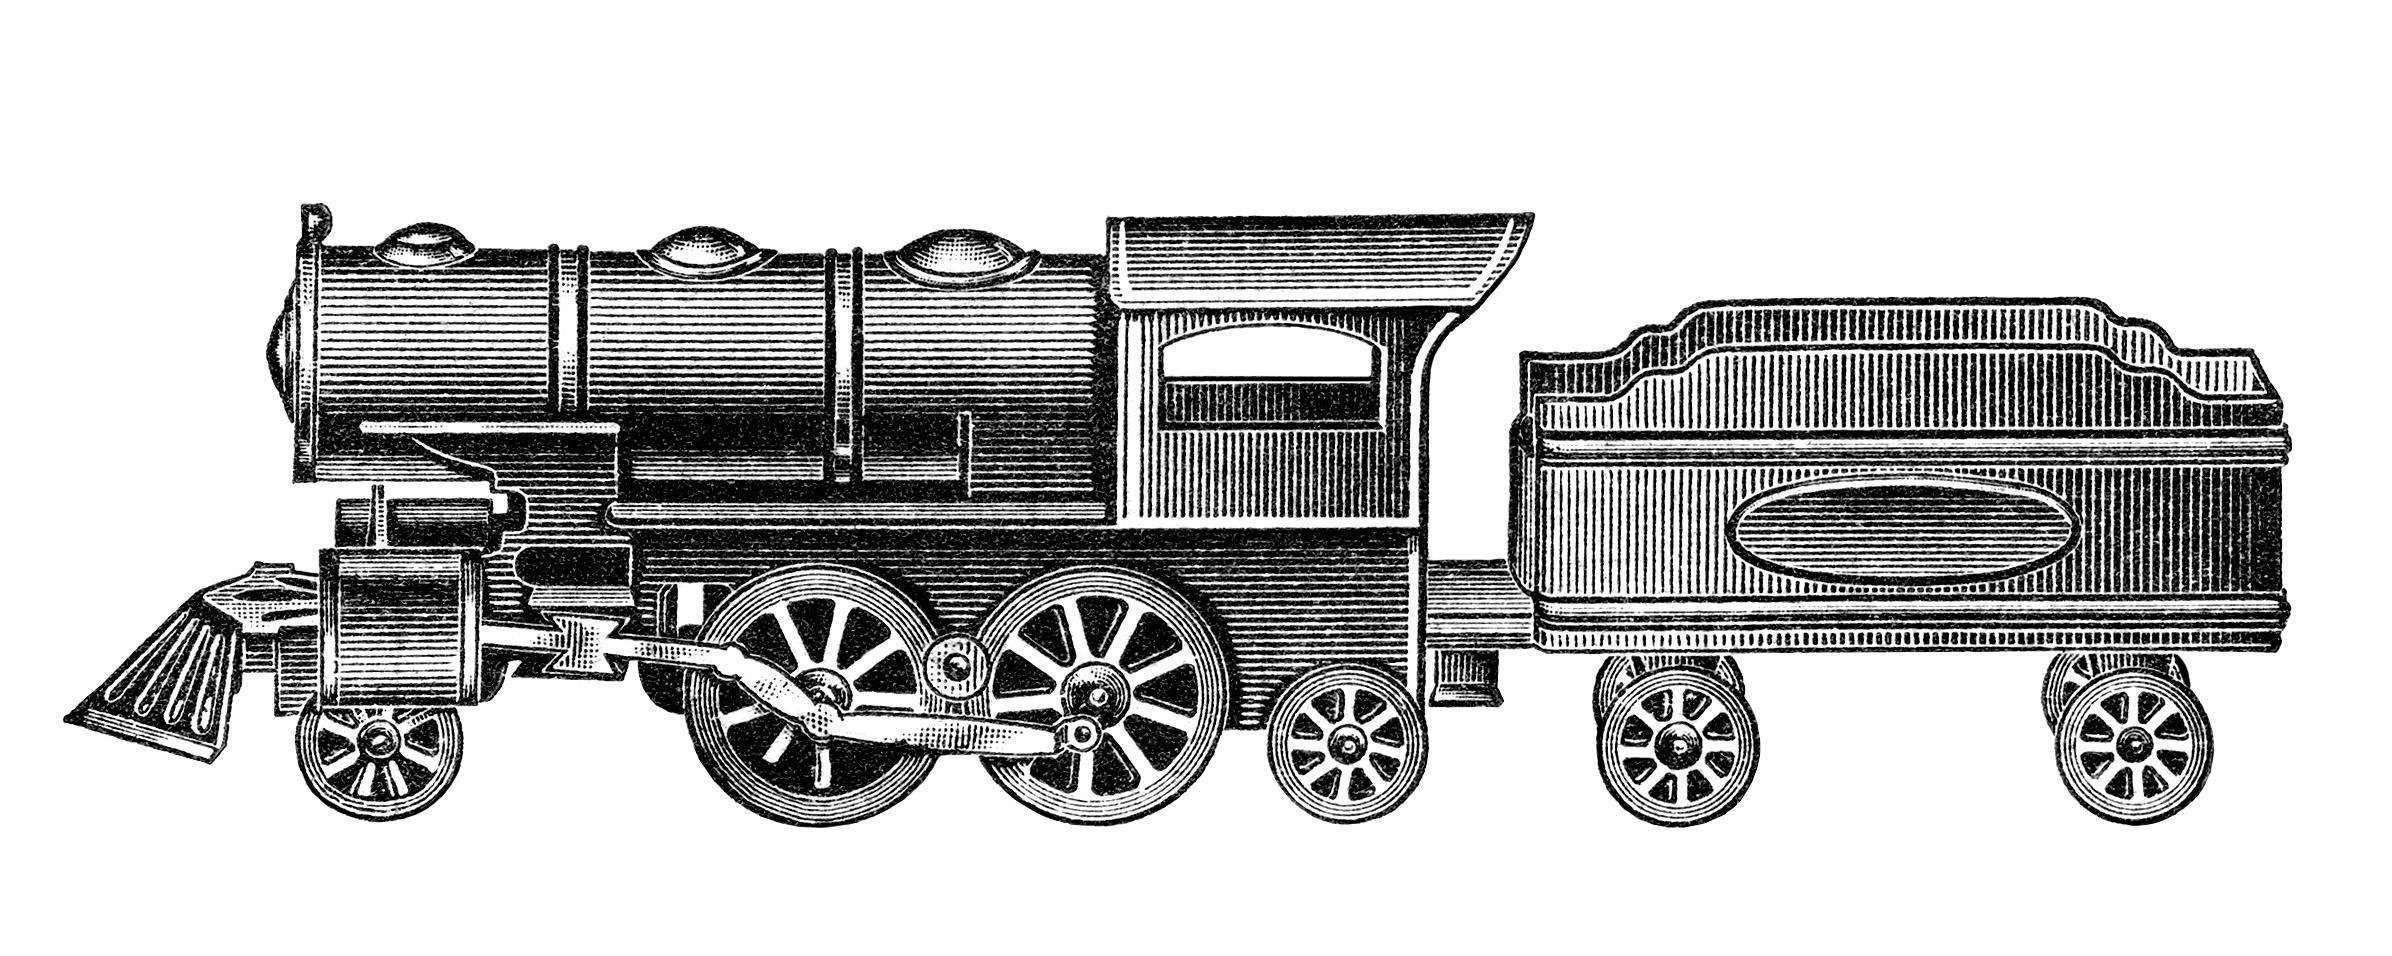 Train Engine Black And White Clipart.